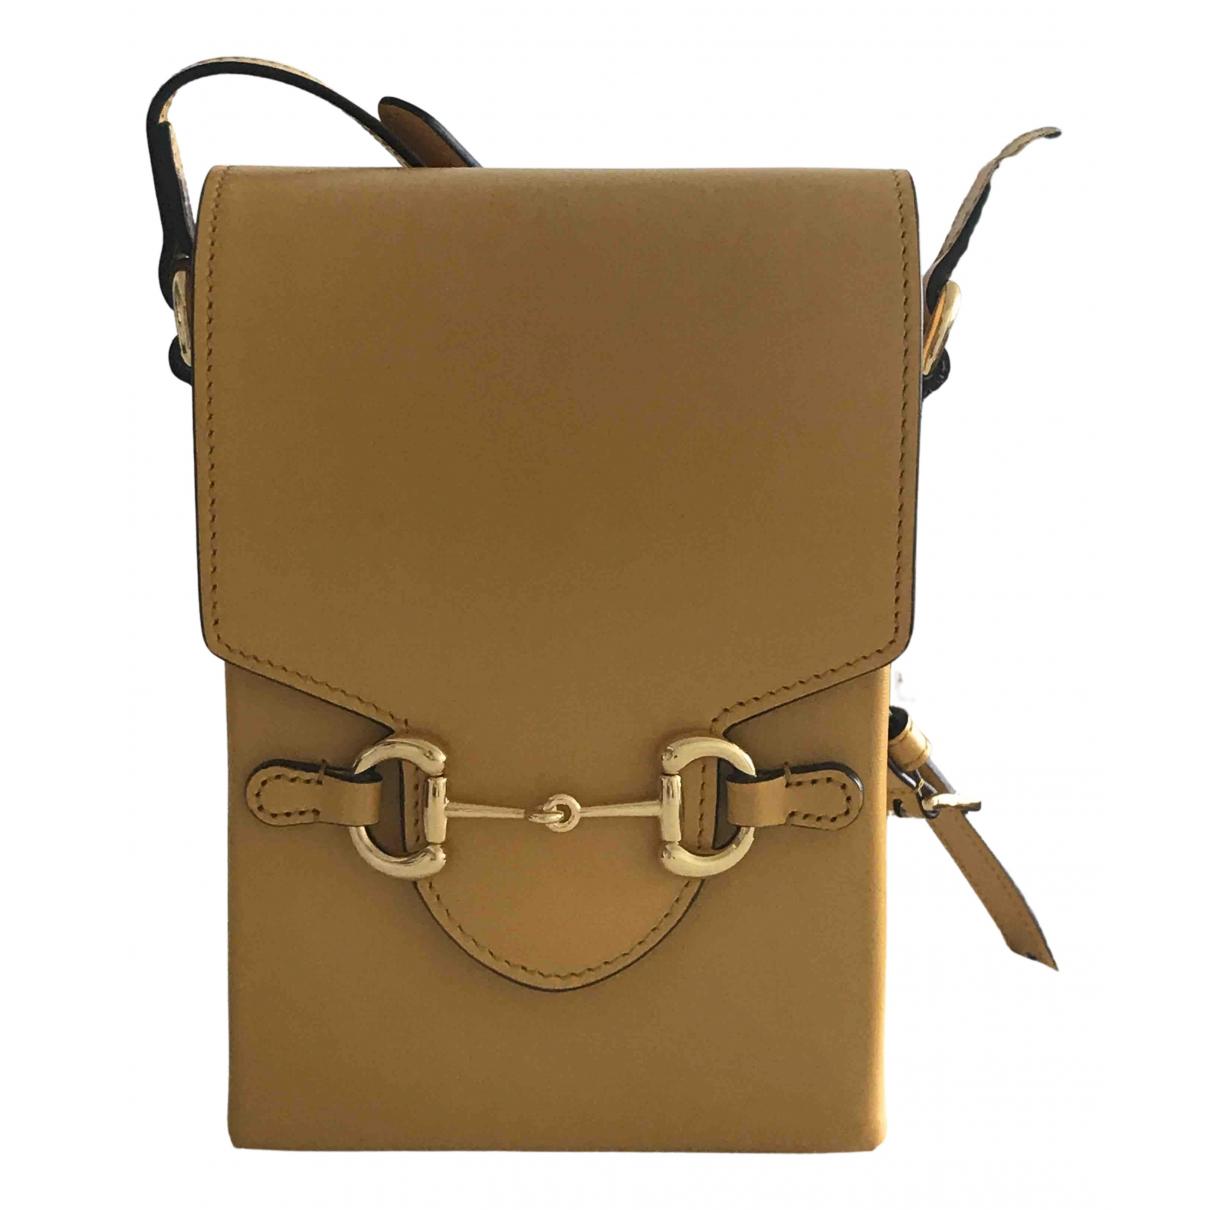 Gucci 1955 Yellow Leather handbag for Women N